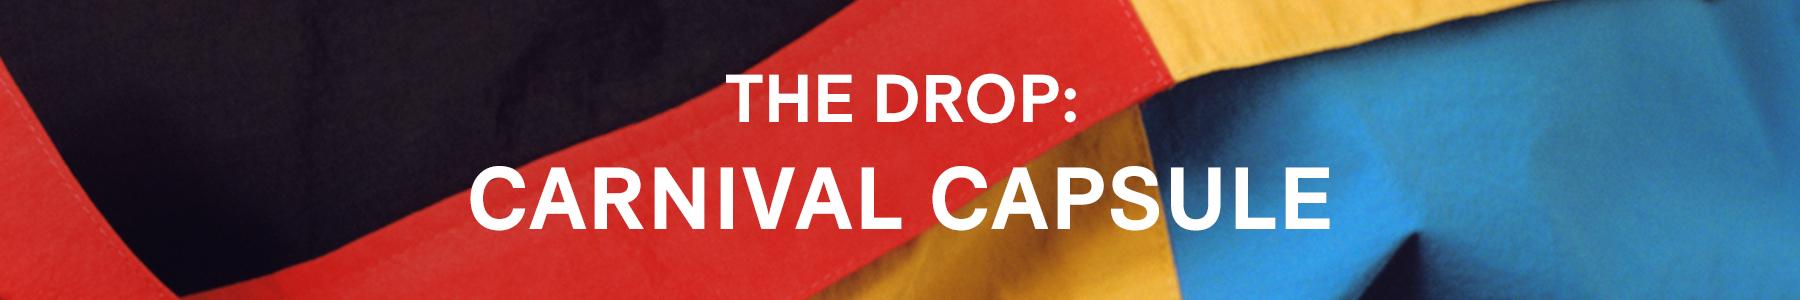 The Drop Banner - Carnival Capsule